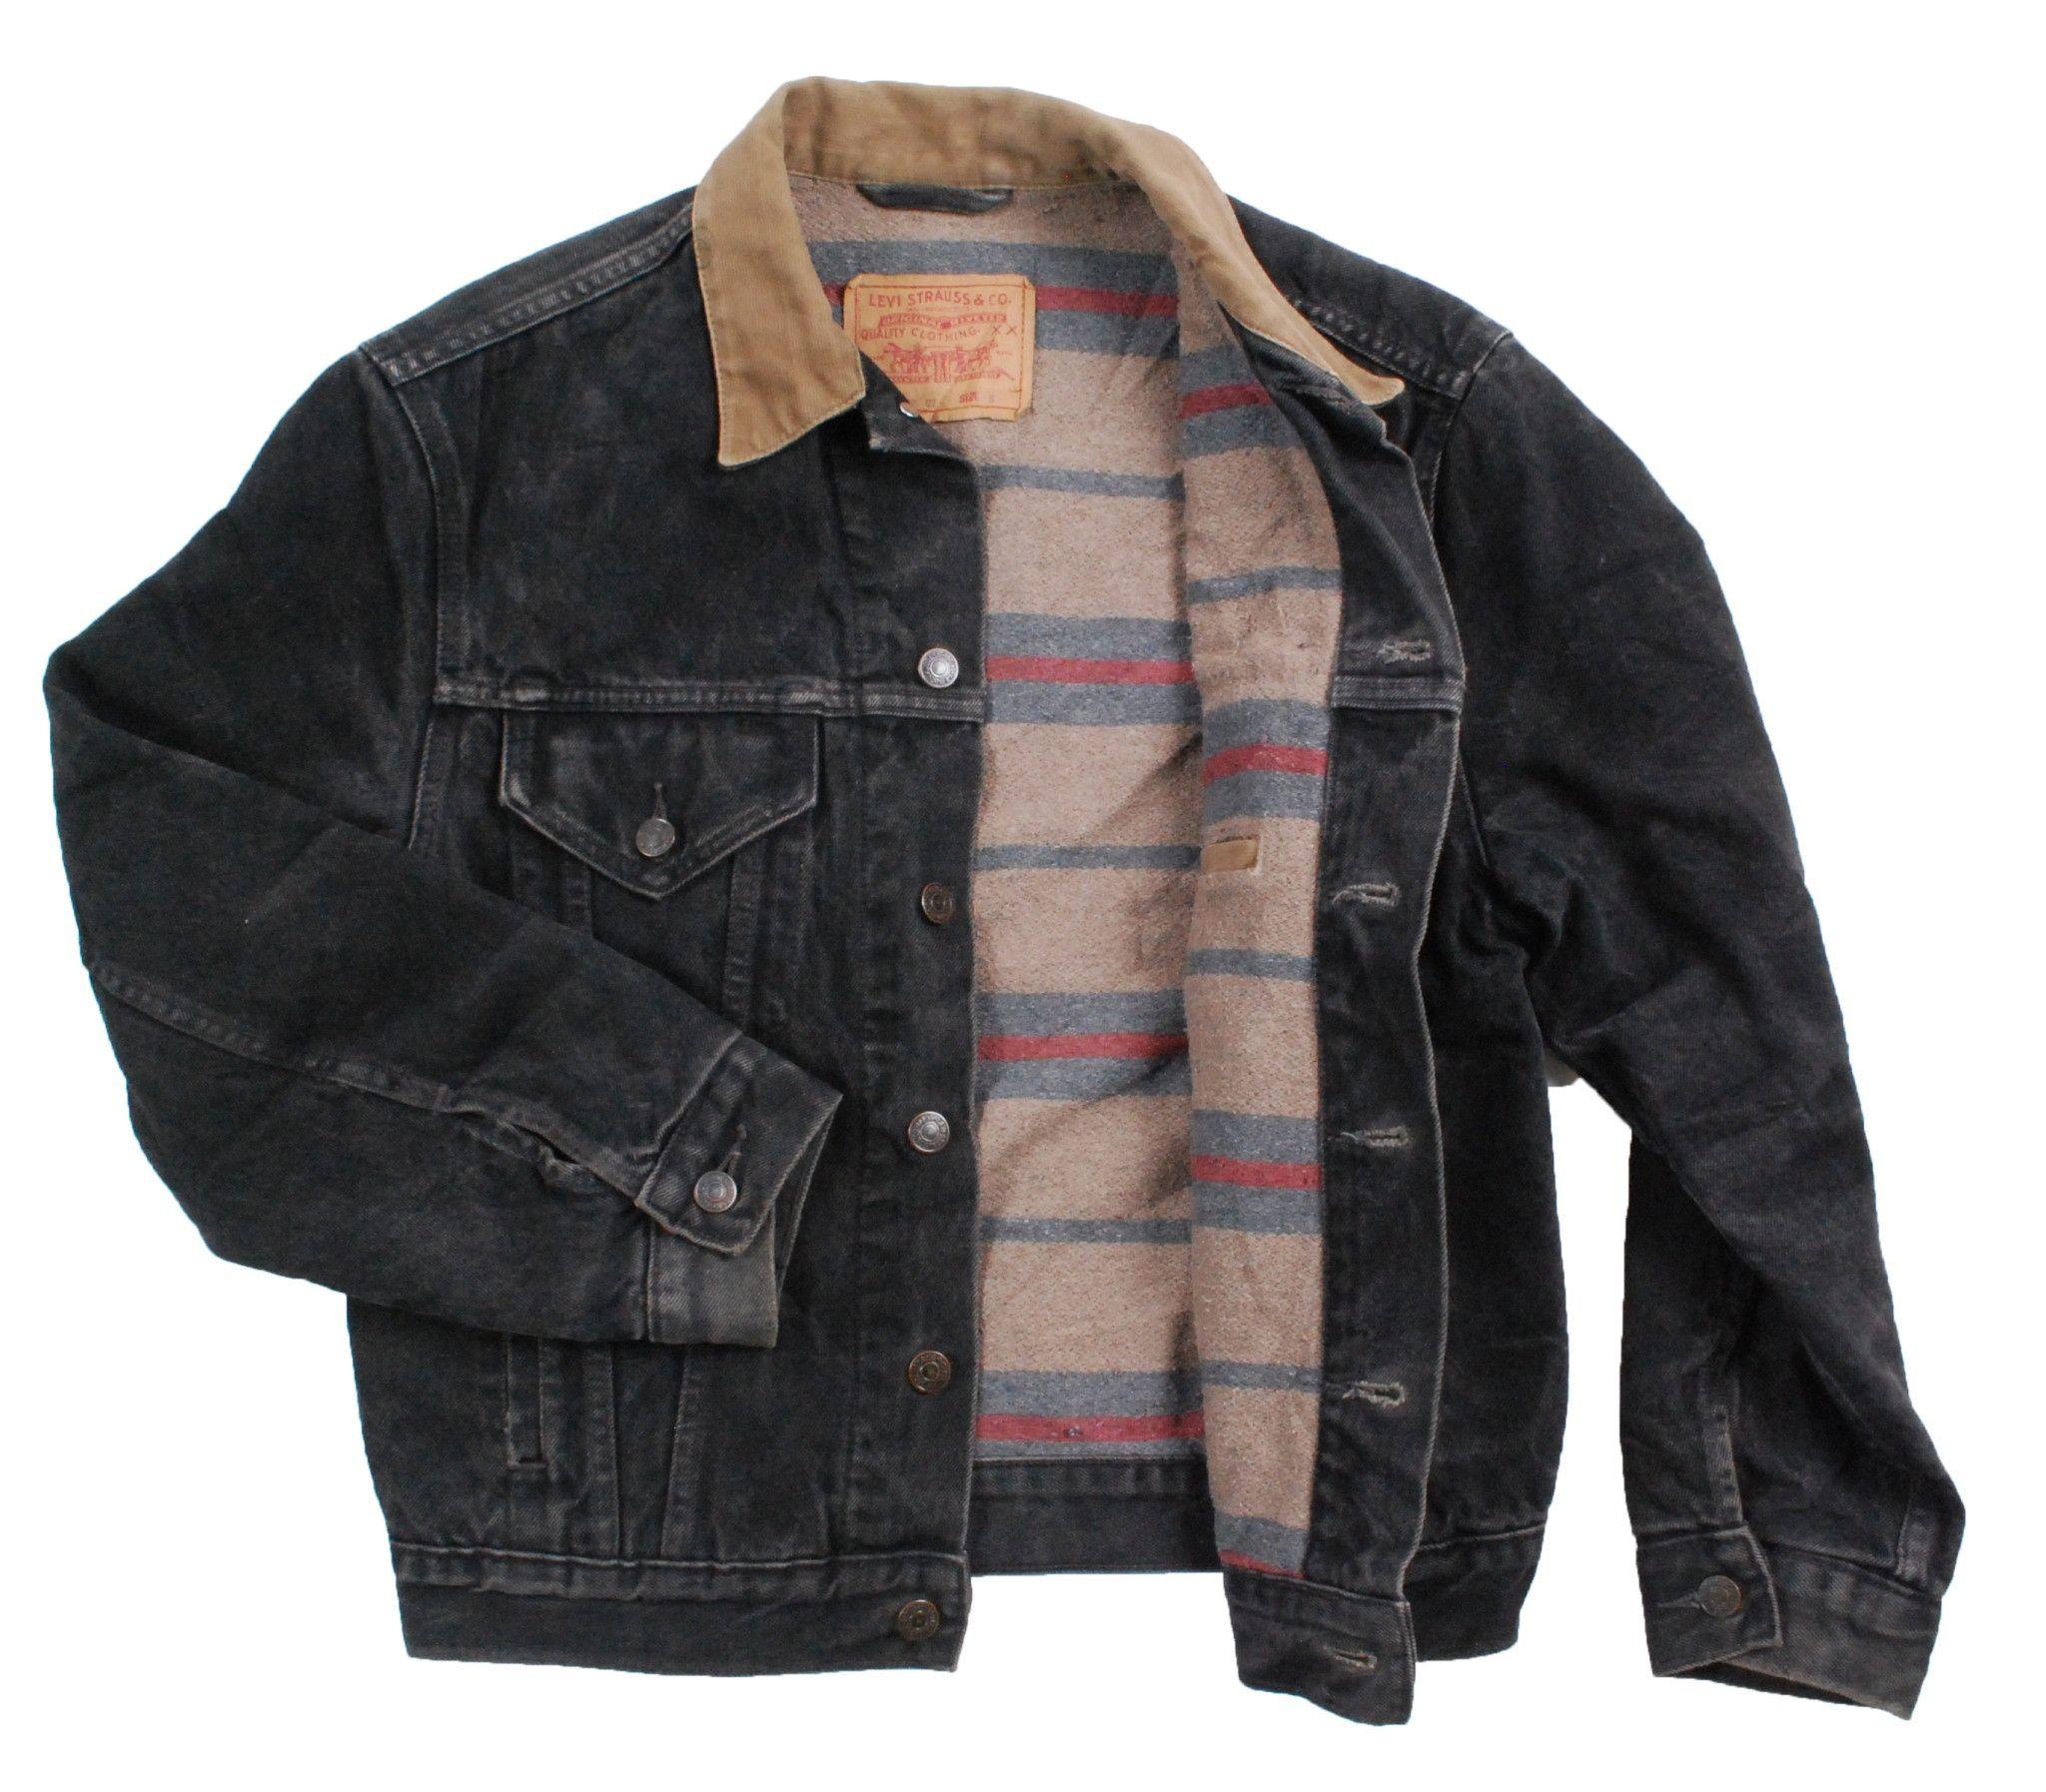 4bae00668 Vintage Black Blanket lined Levi 70602 02 denim jean jacket - Small ...